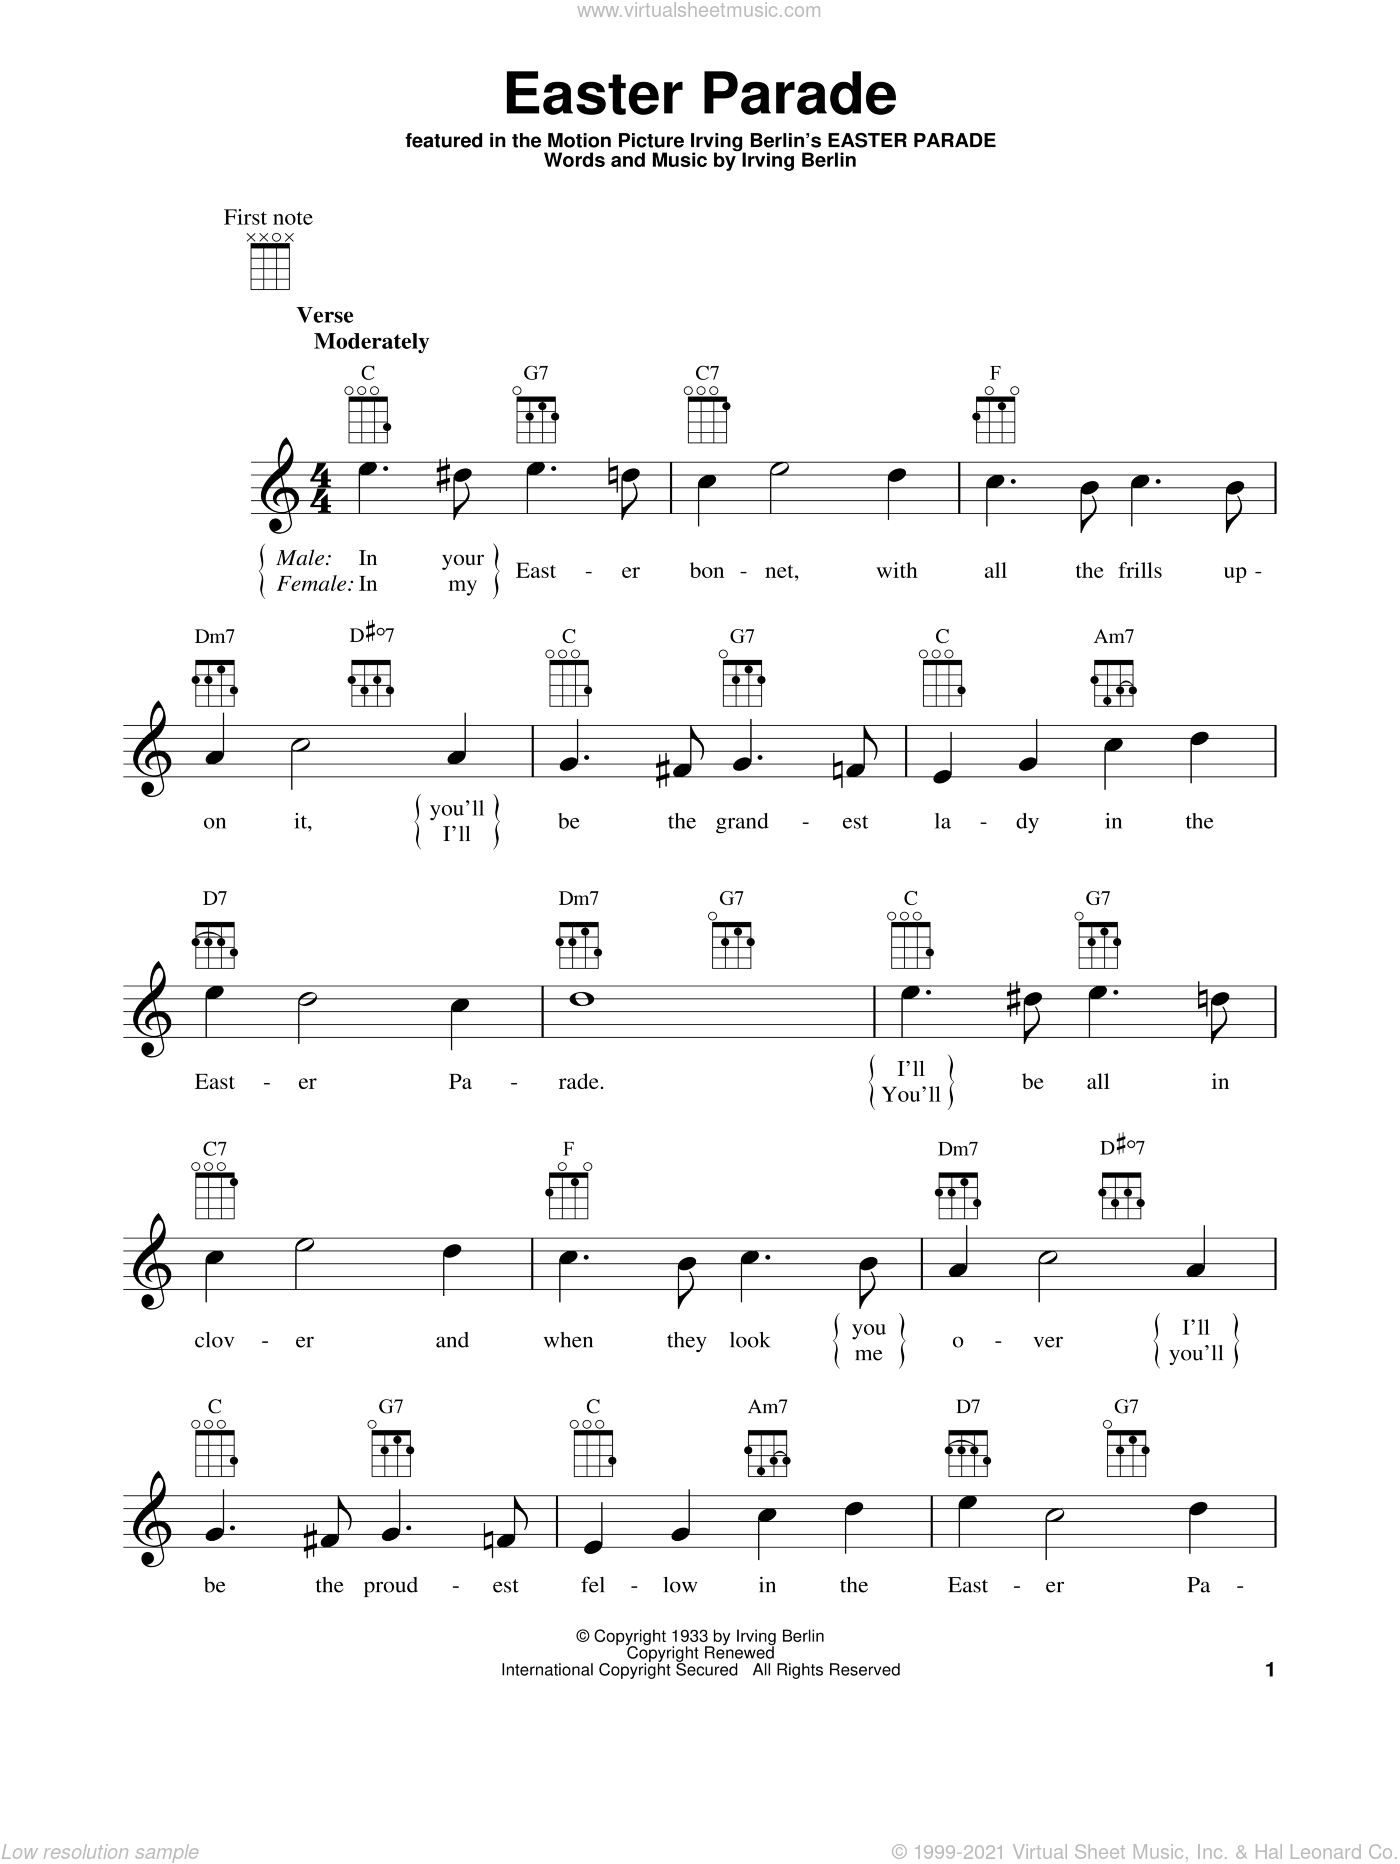 Easter Parade sheet music for ukulele by Irving Berlin, intermediate skill level